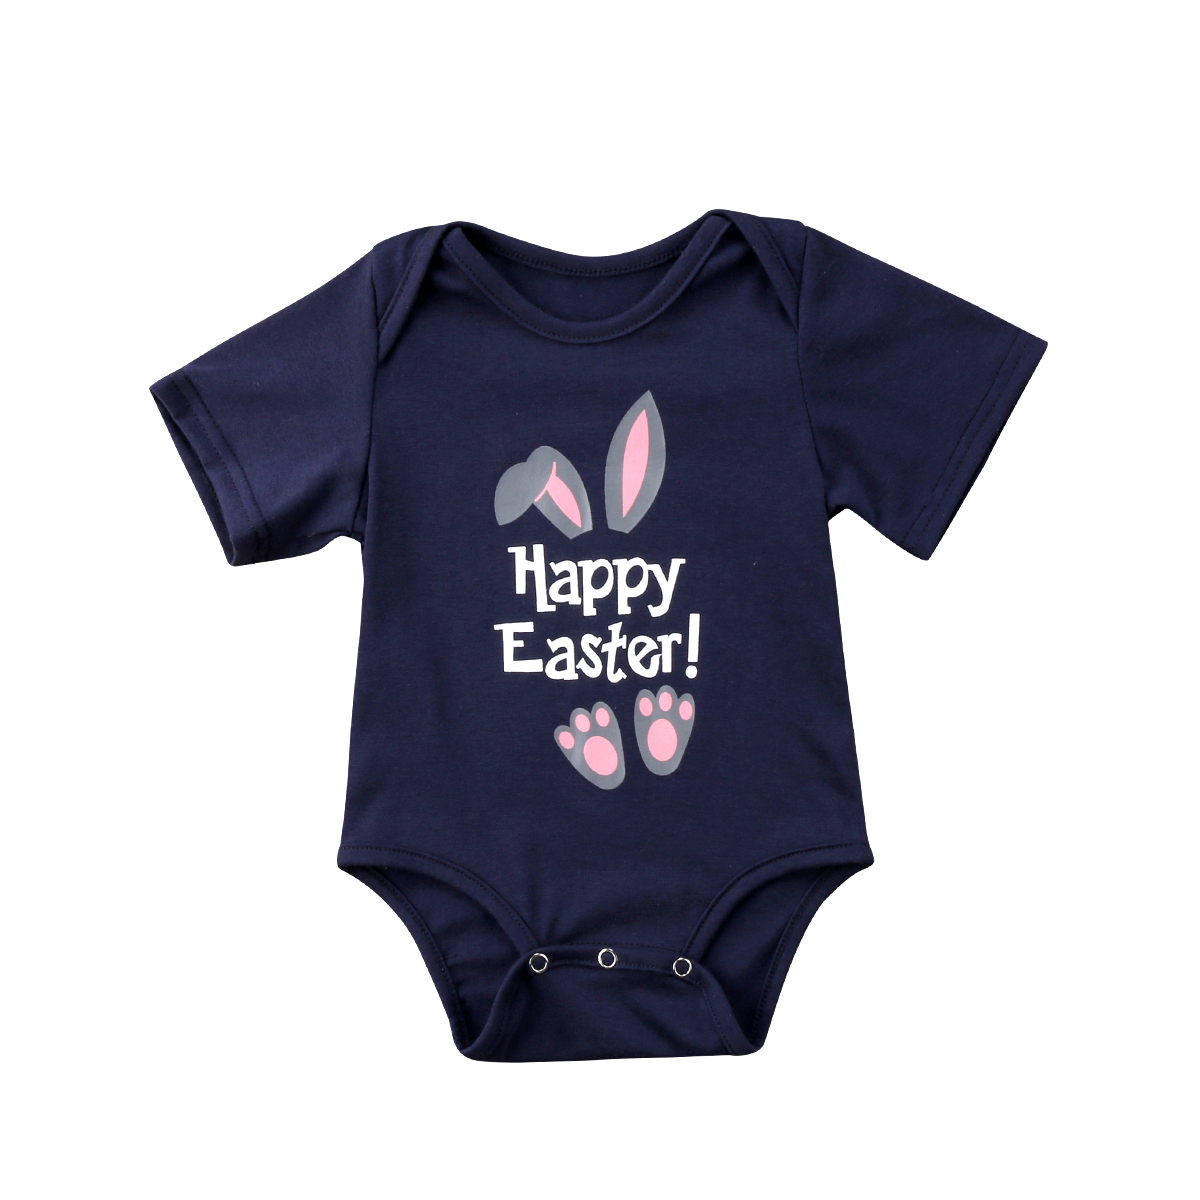 Easter Newborn Baby Boy Clothes Bunny Ears Bodysuit